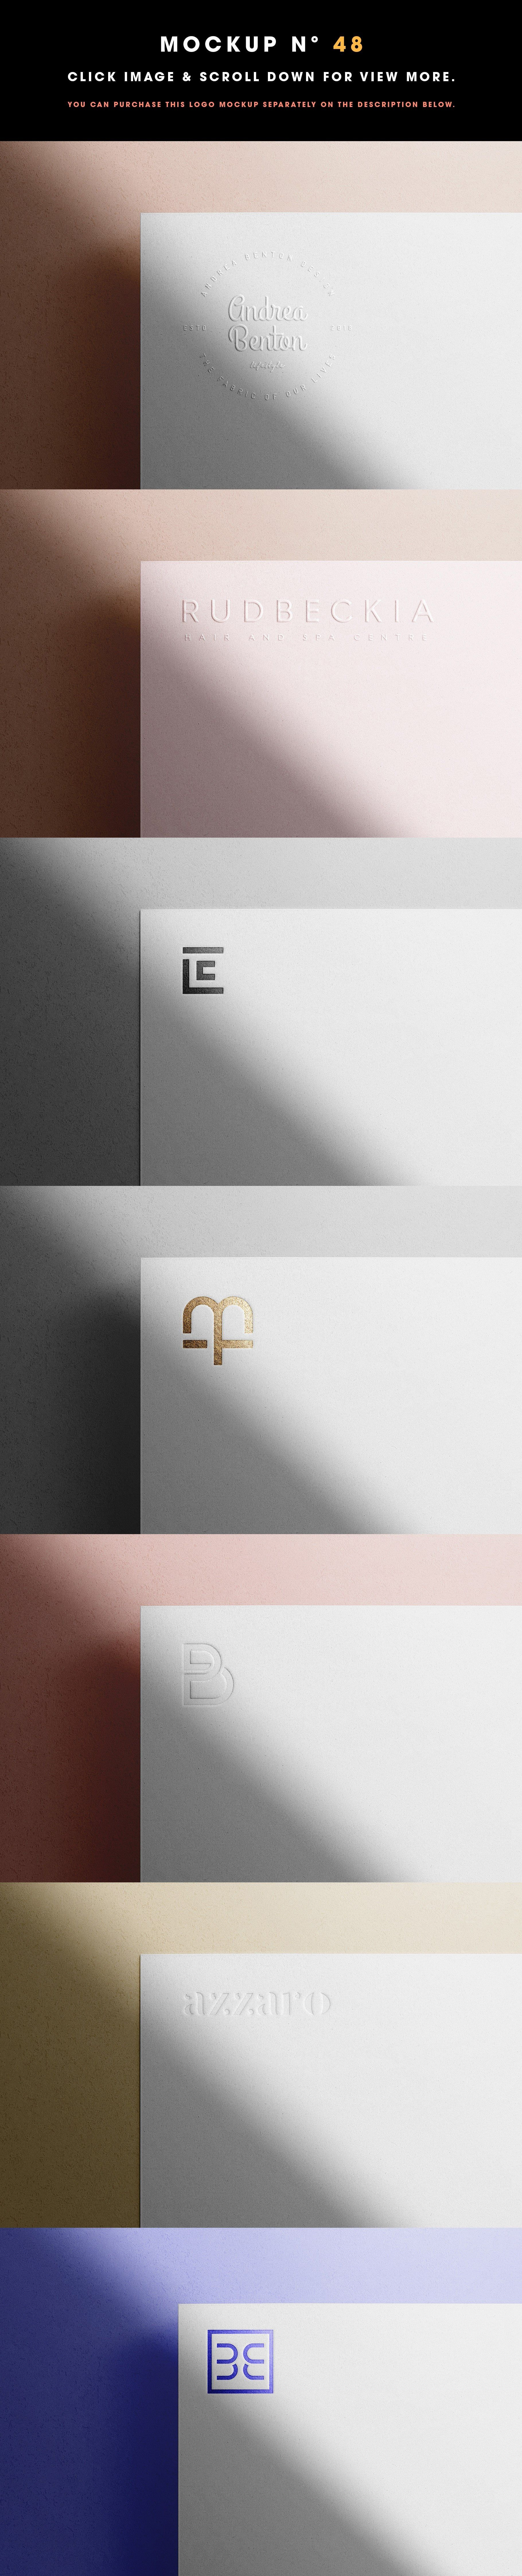 50 Logo Mockup Branding Bundle V2 Logo Mockup Branding Mockups Luxury Paper